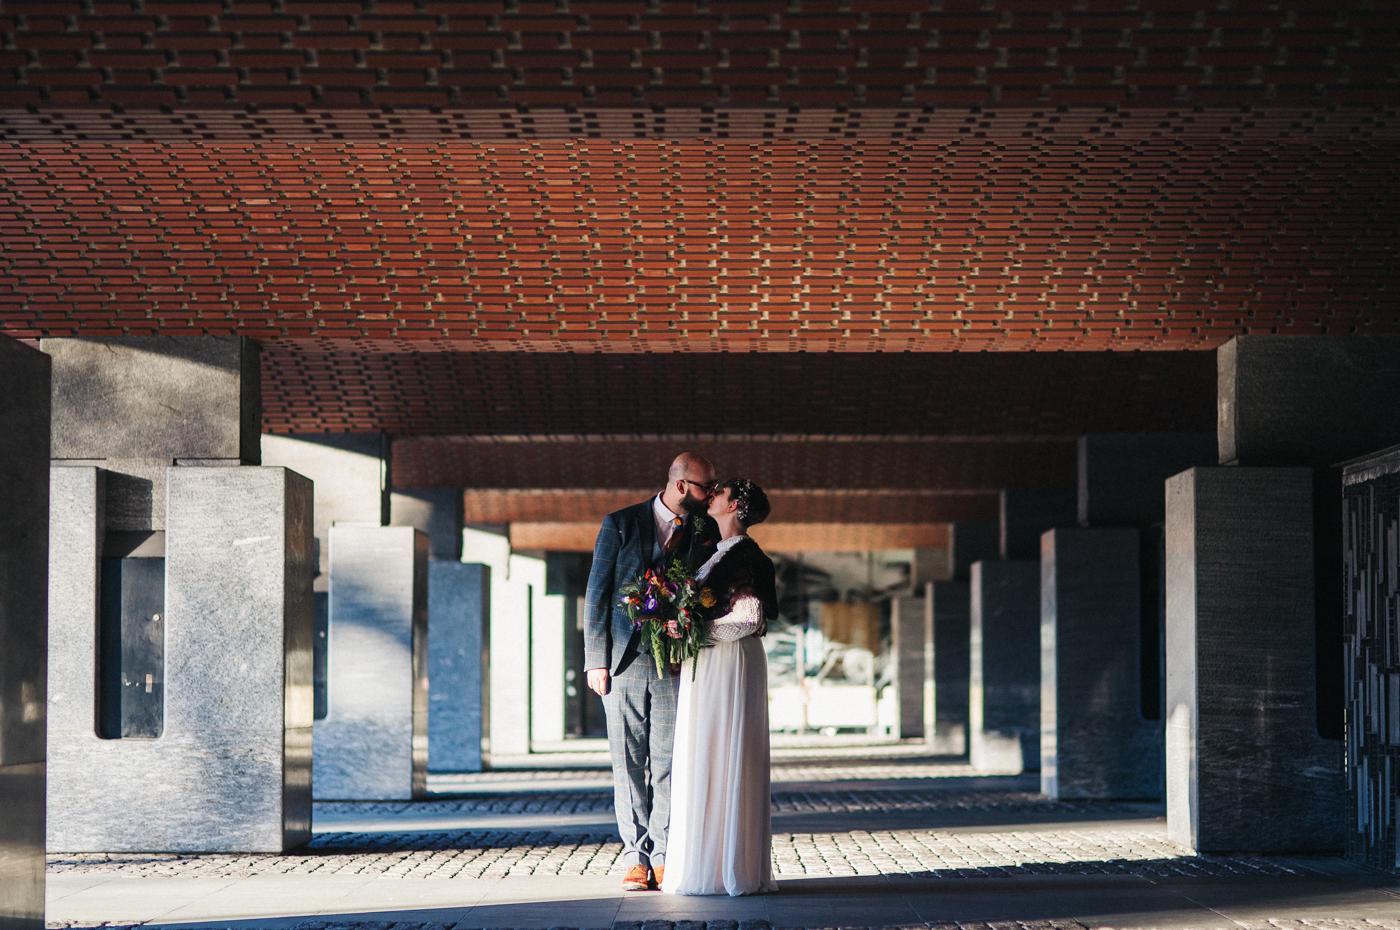 teesside-newcastle-gateshead-wedding-photography-photographer-creative-0048.jpg